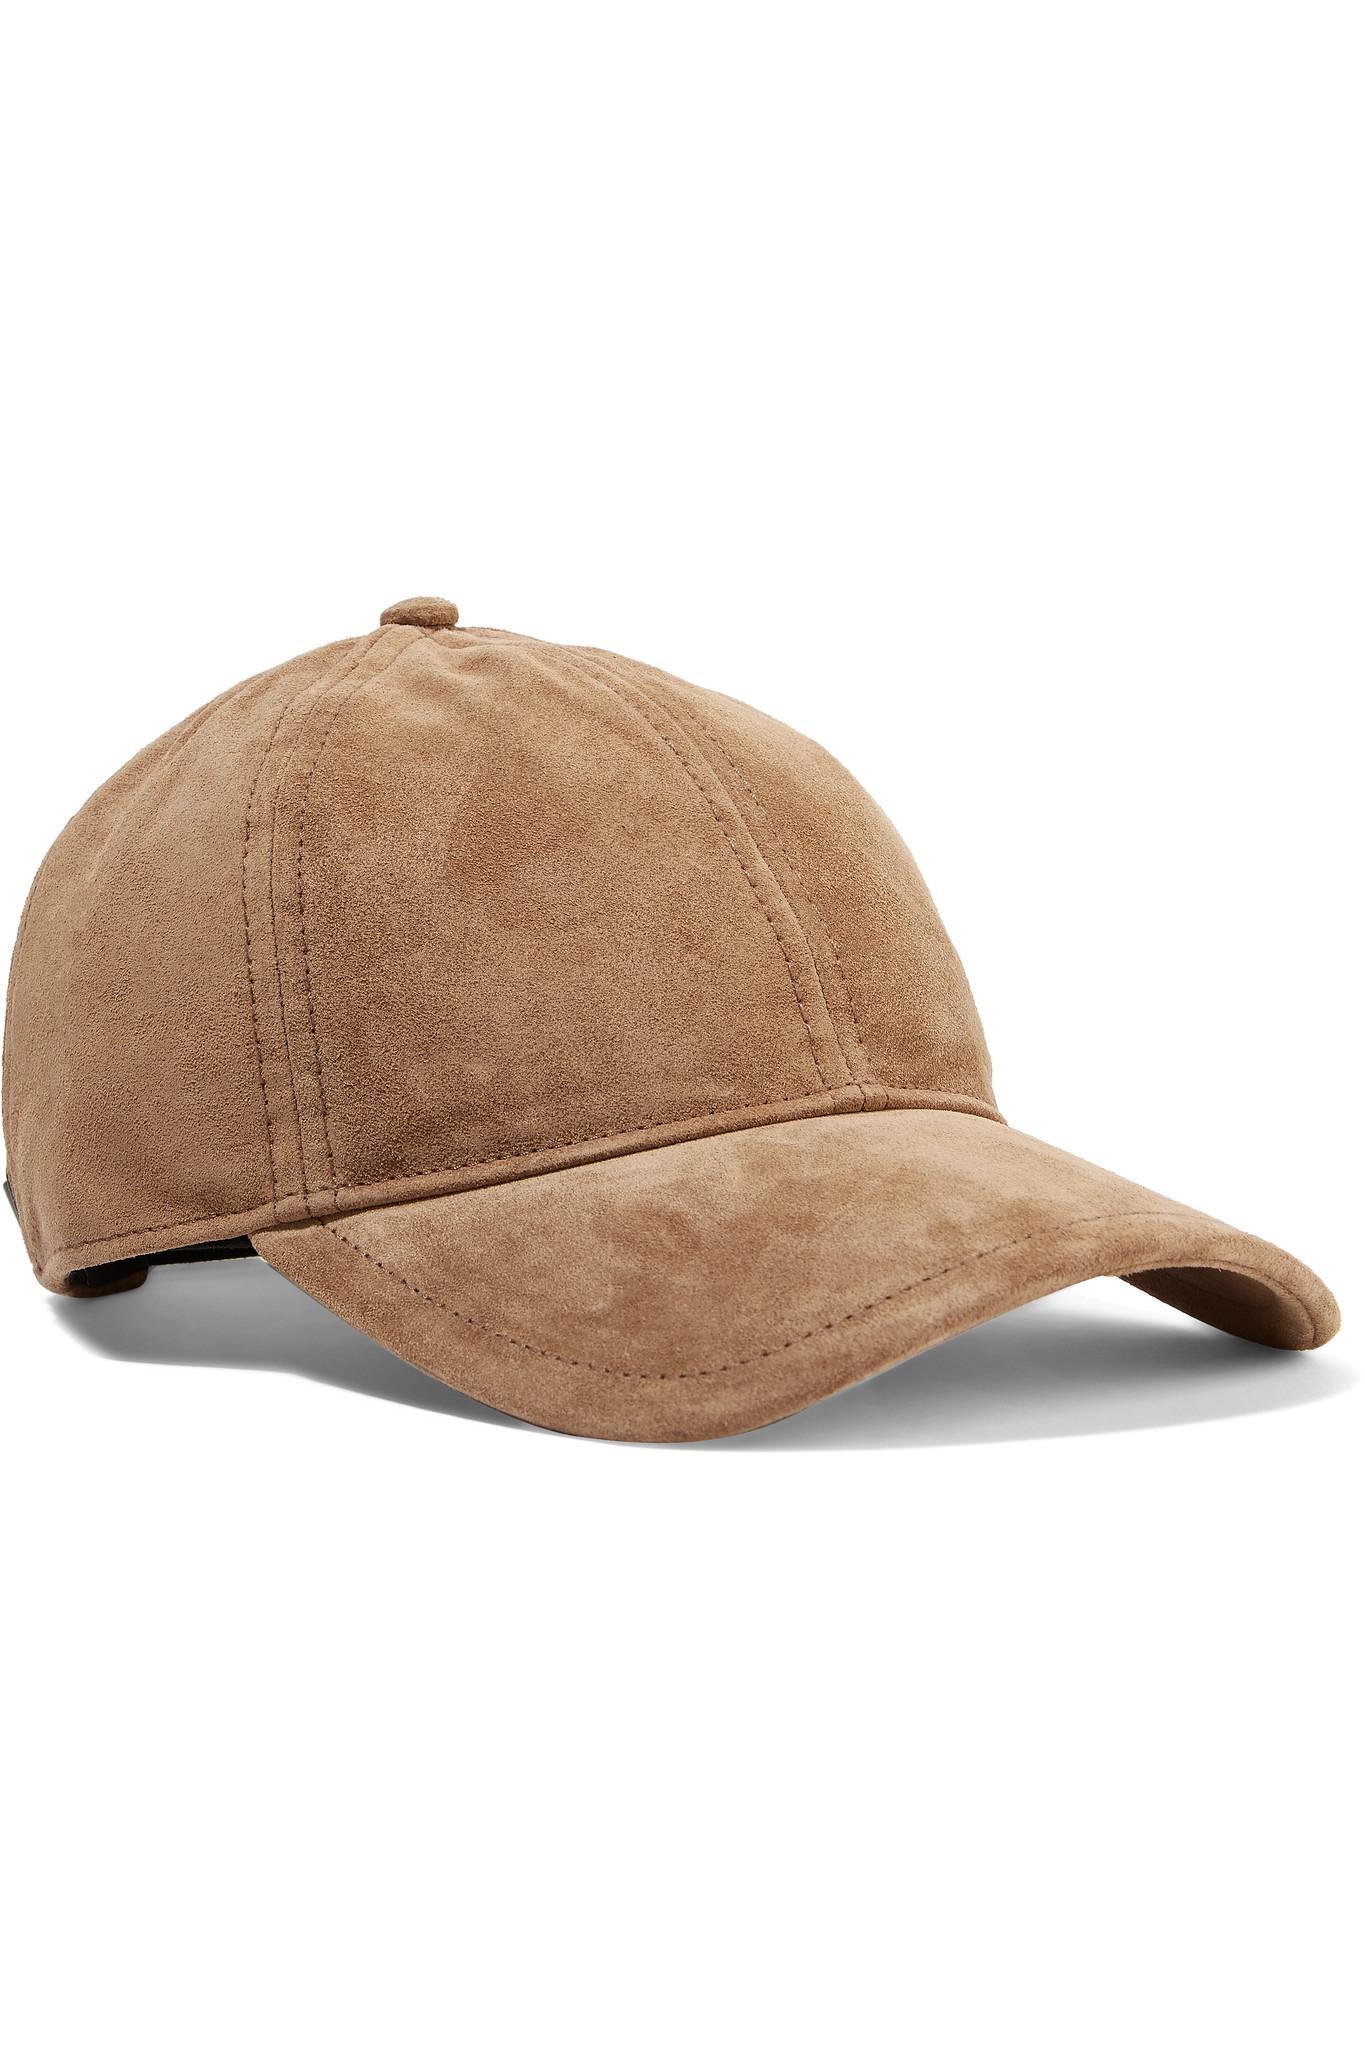 cf0e13c468eb7 Rag   Bone Marilyn Leather-trimmed Suede Baseball Cap in Brown - Lyst